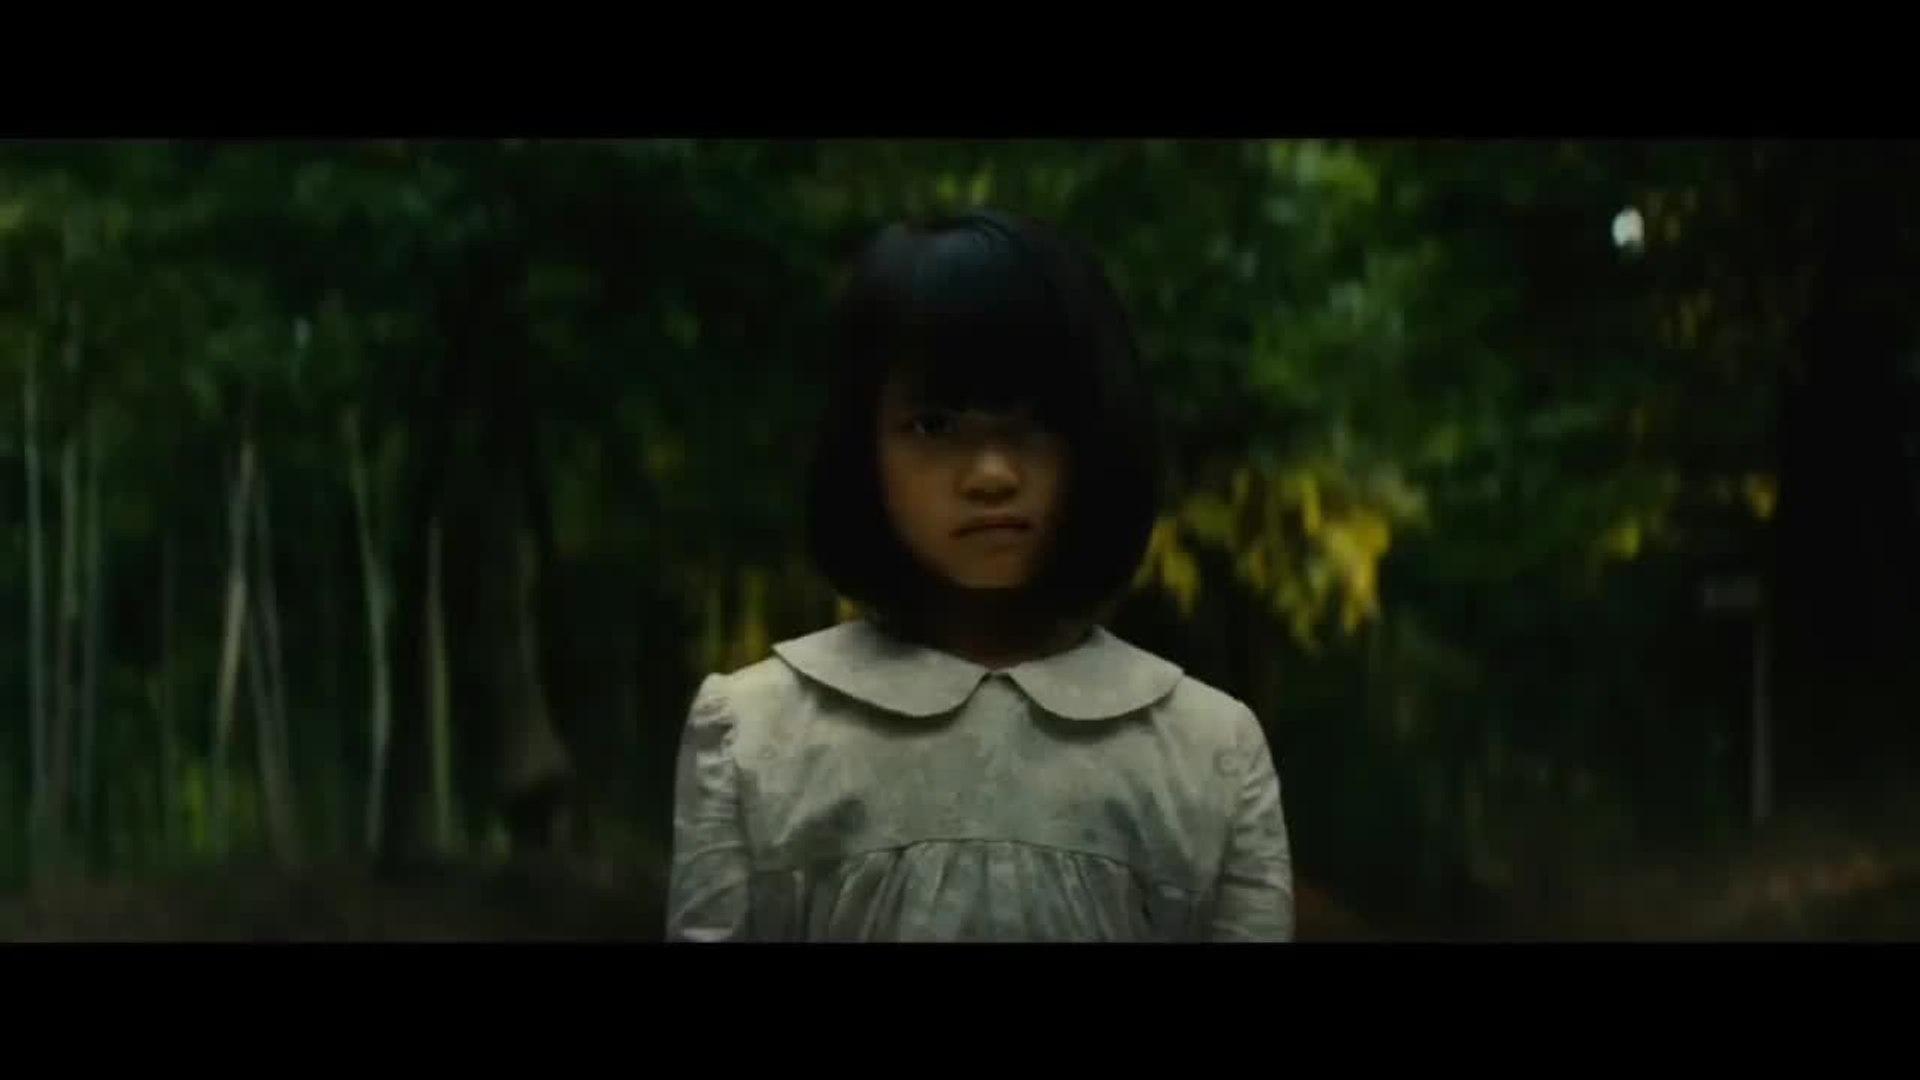 Bleach Live Action Movie Full Trailer